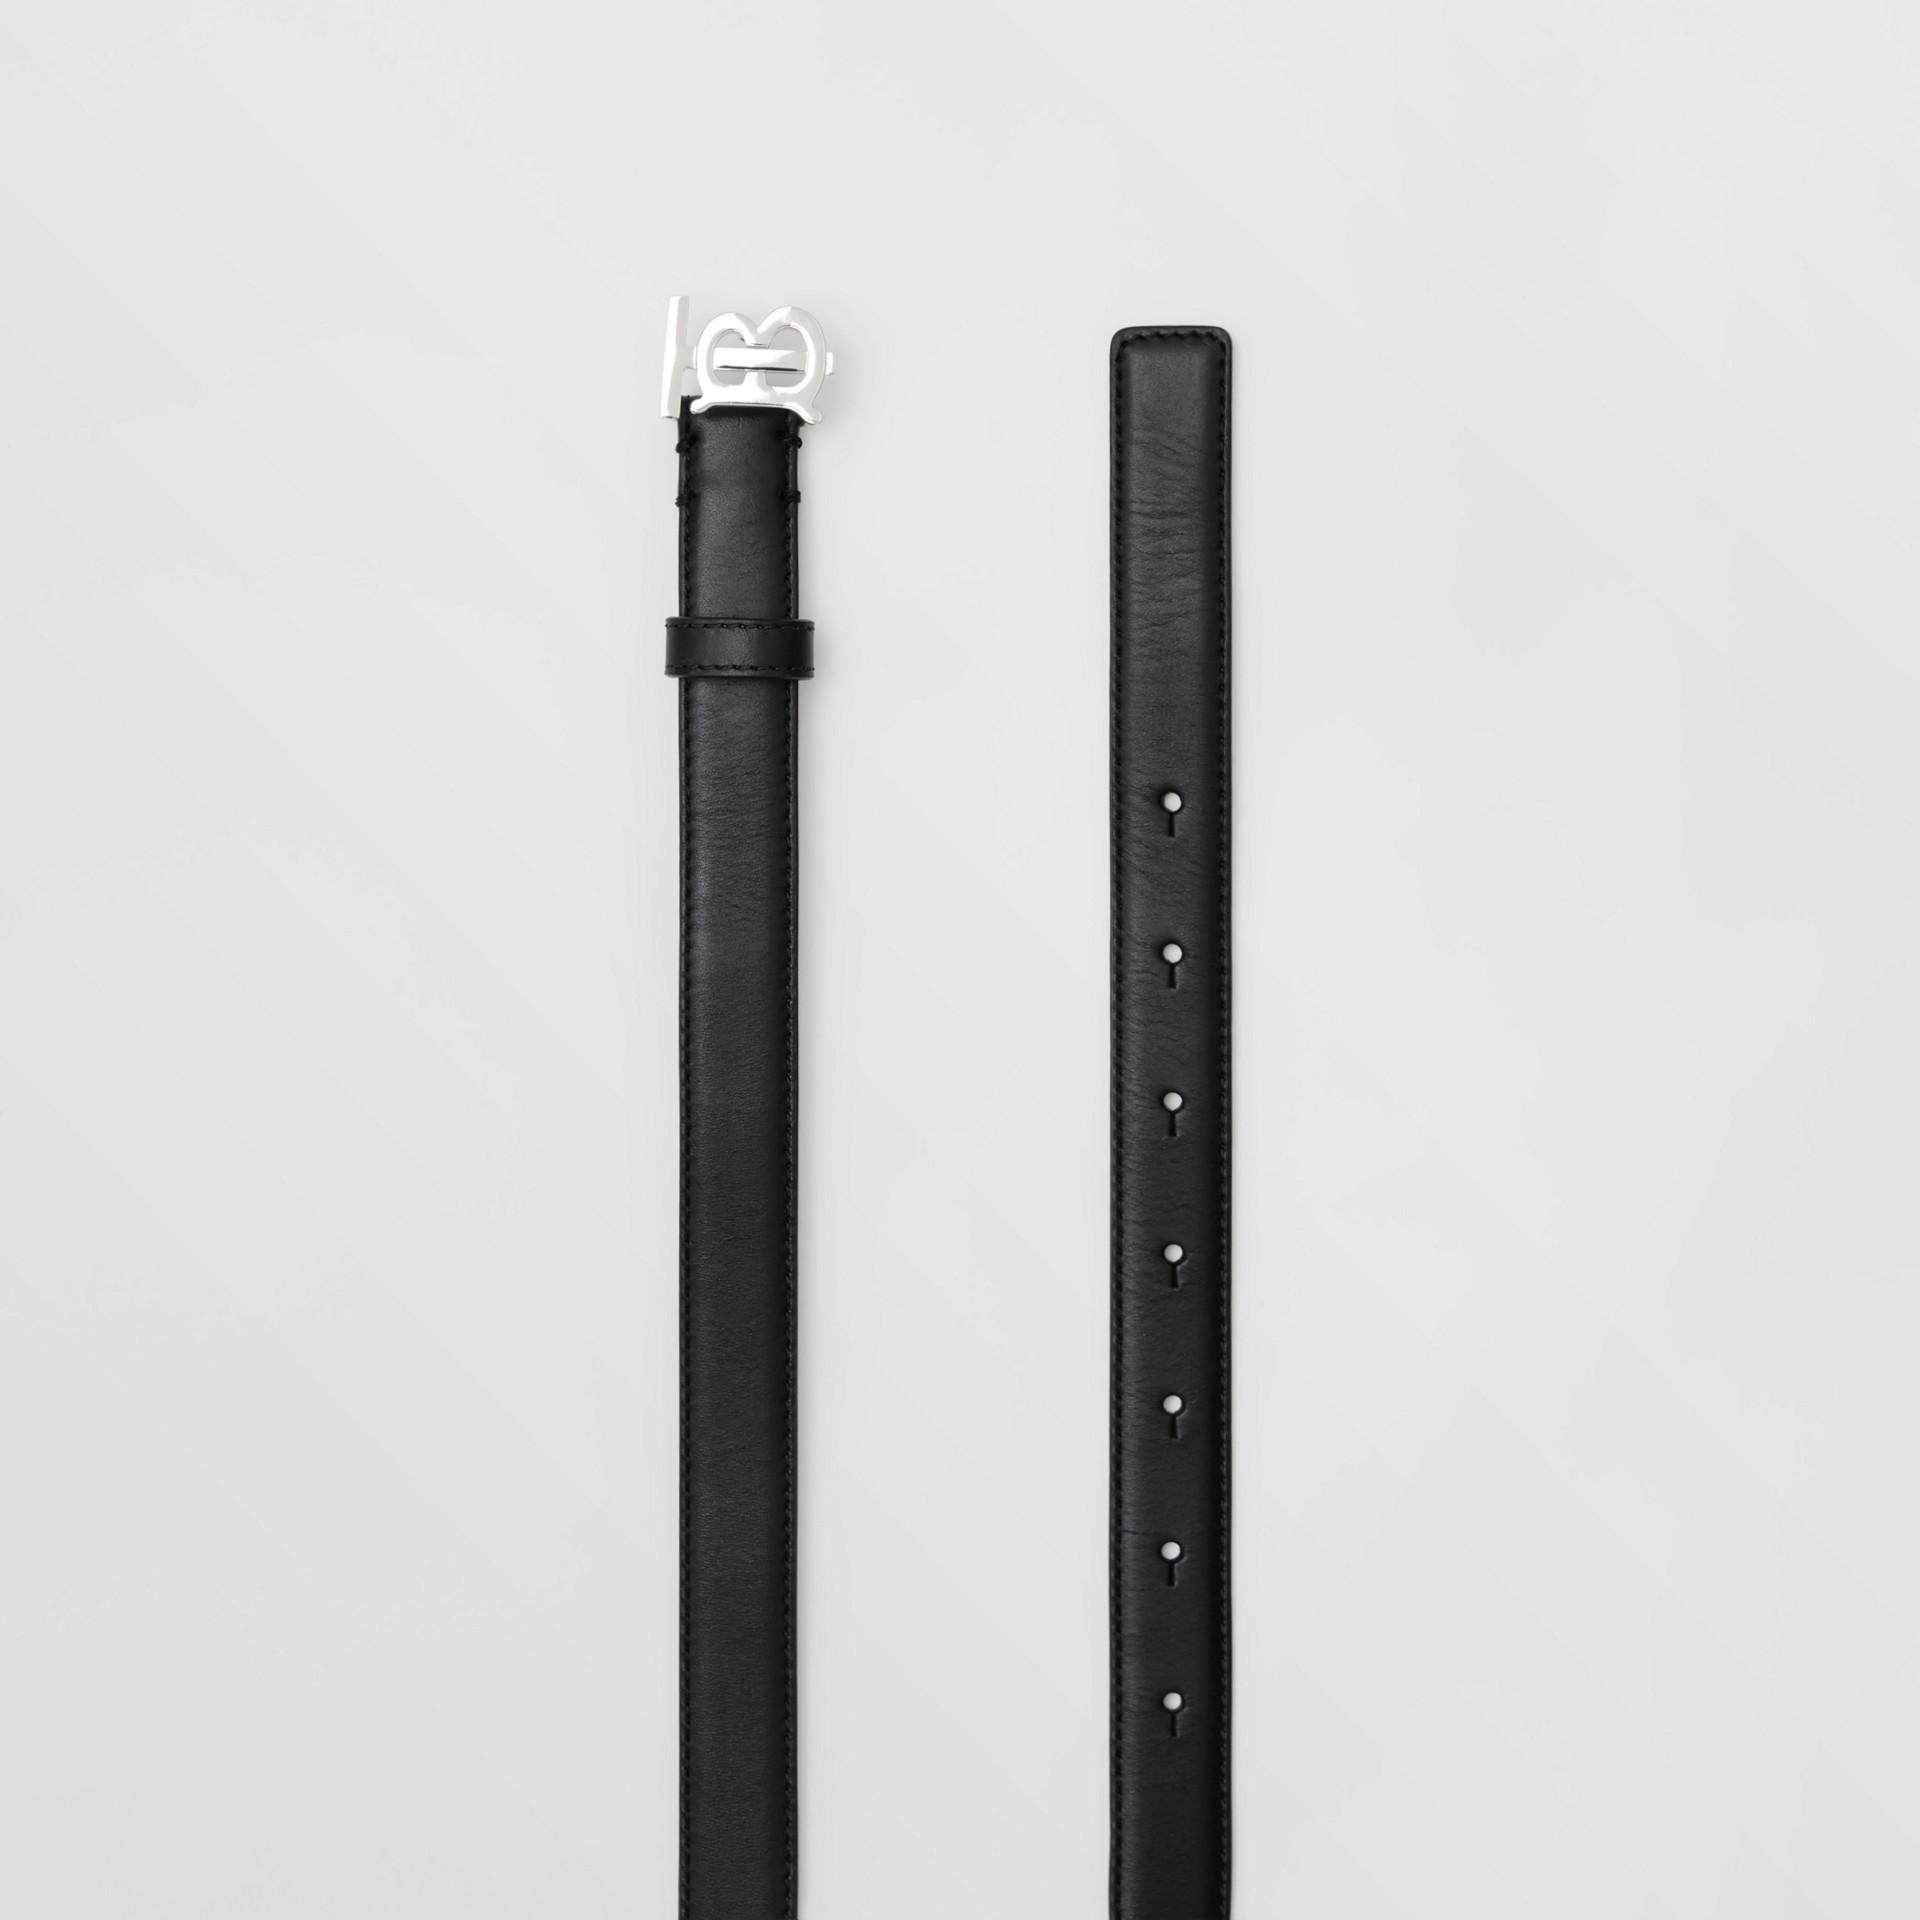 Monogram Motif Leather Belt in Black/palladio - Women | Burberry Canada - gallery image 5